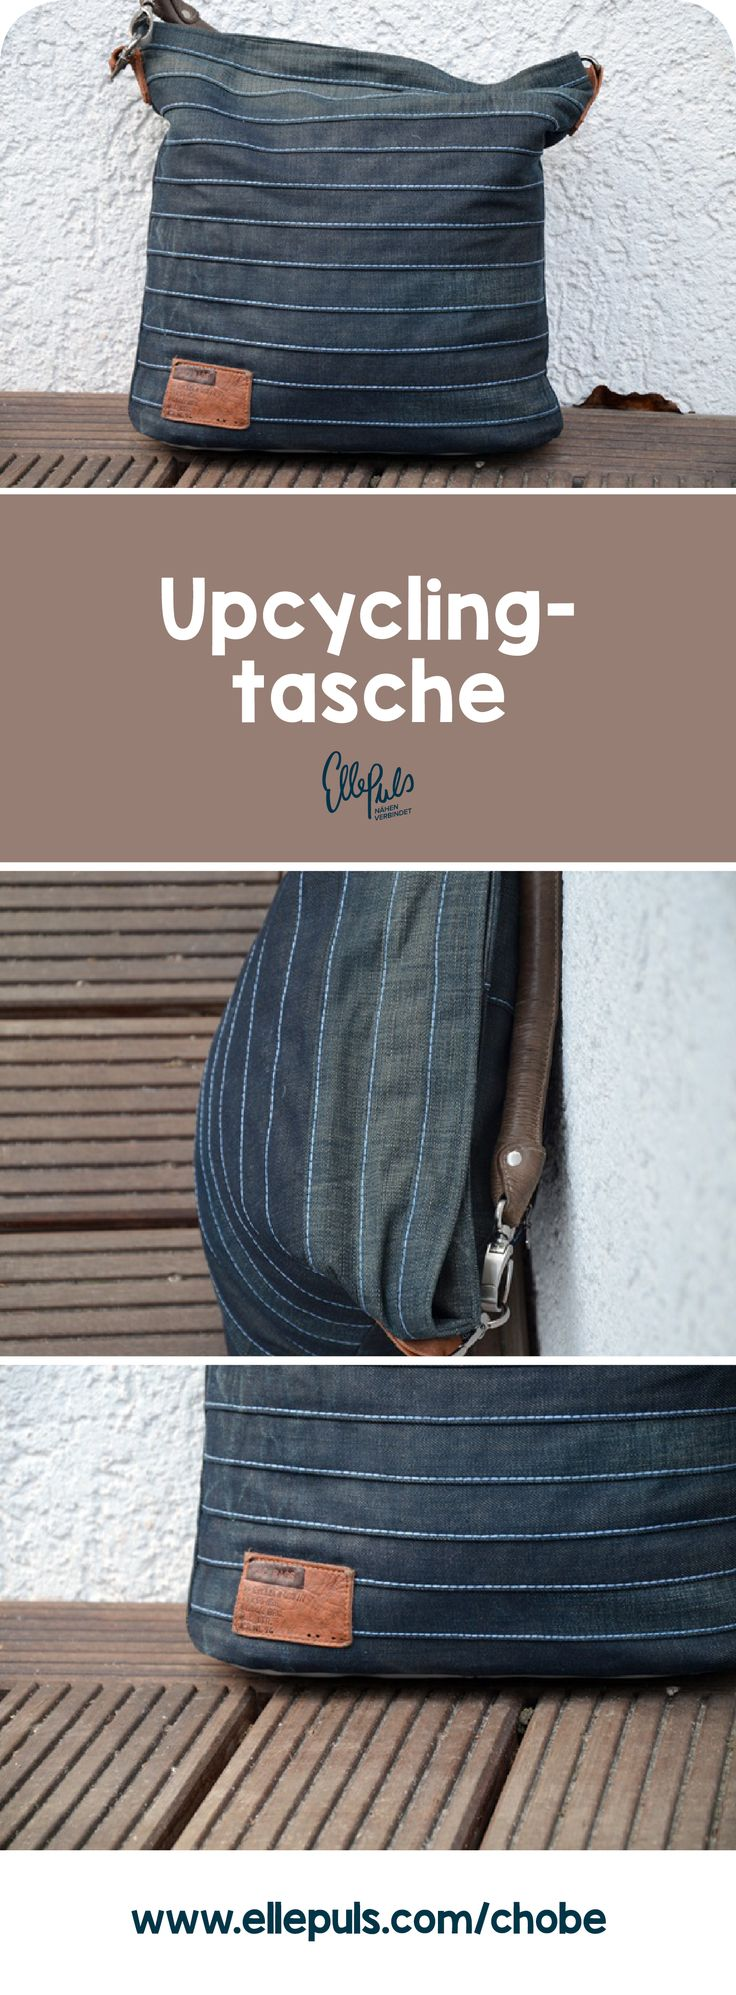 """Chobe"" Upcycling Tasche – Schnittmuster und Nähanleitung"